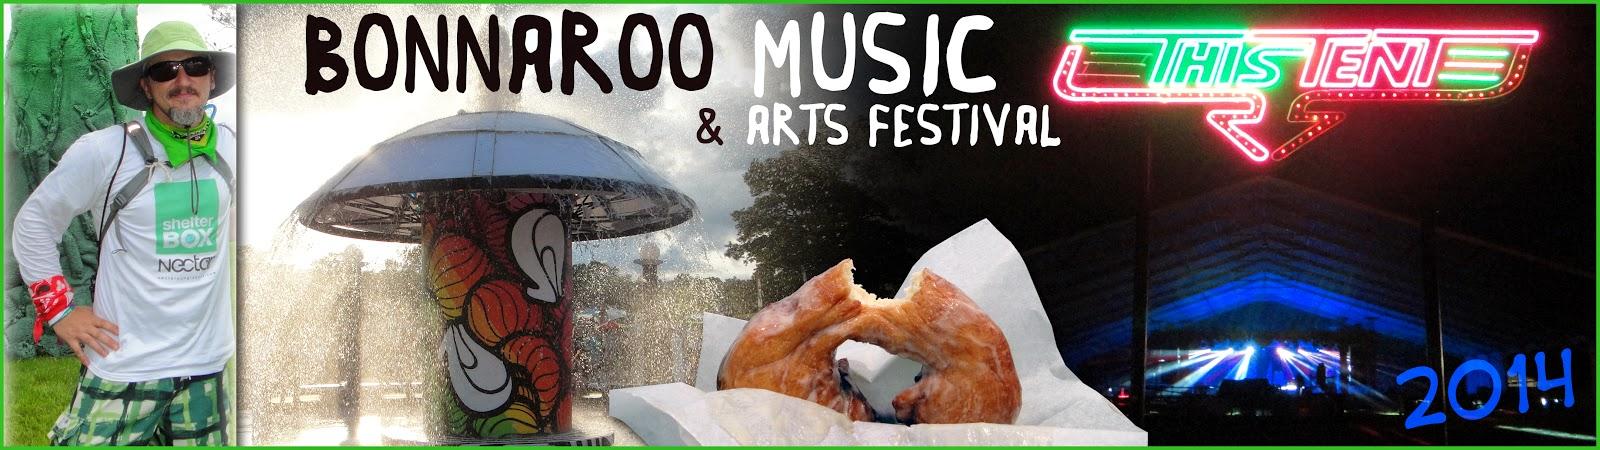 Bonnaroo Chris - Bonnaroo Music Festival 2014